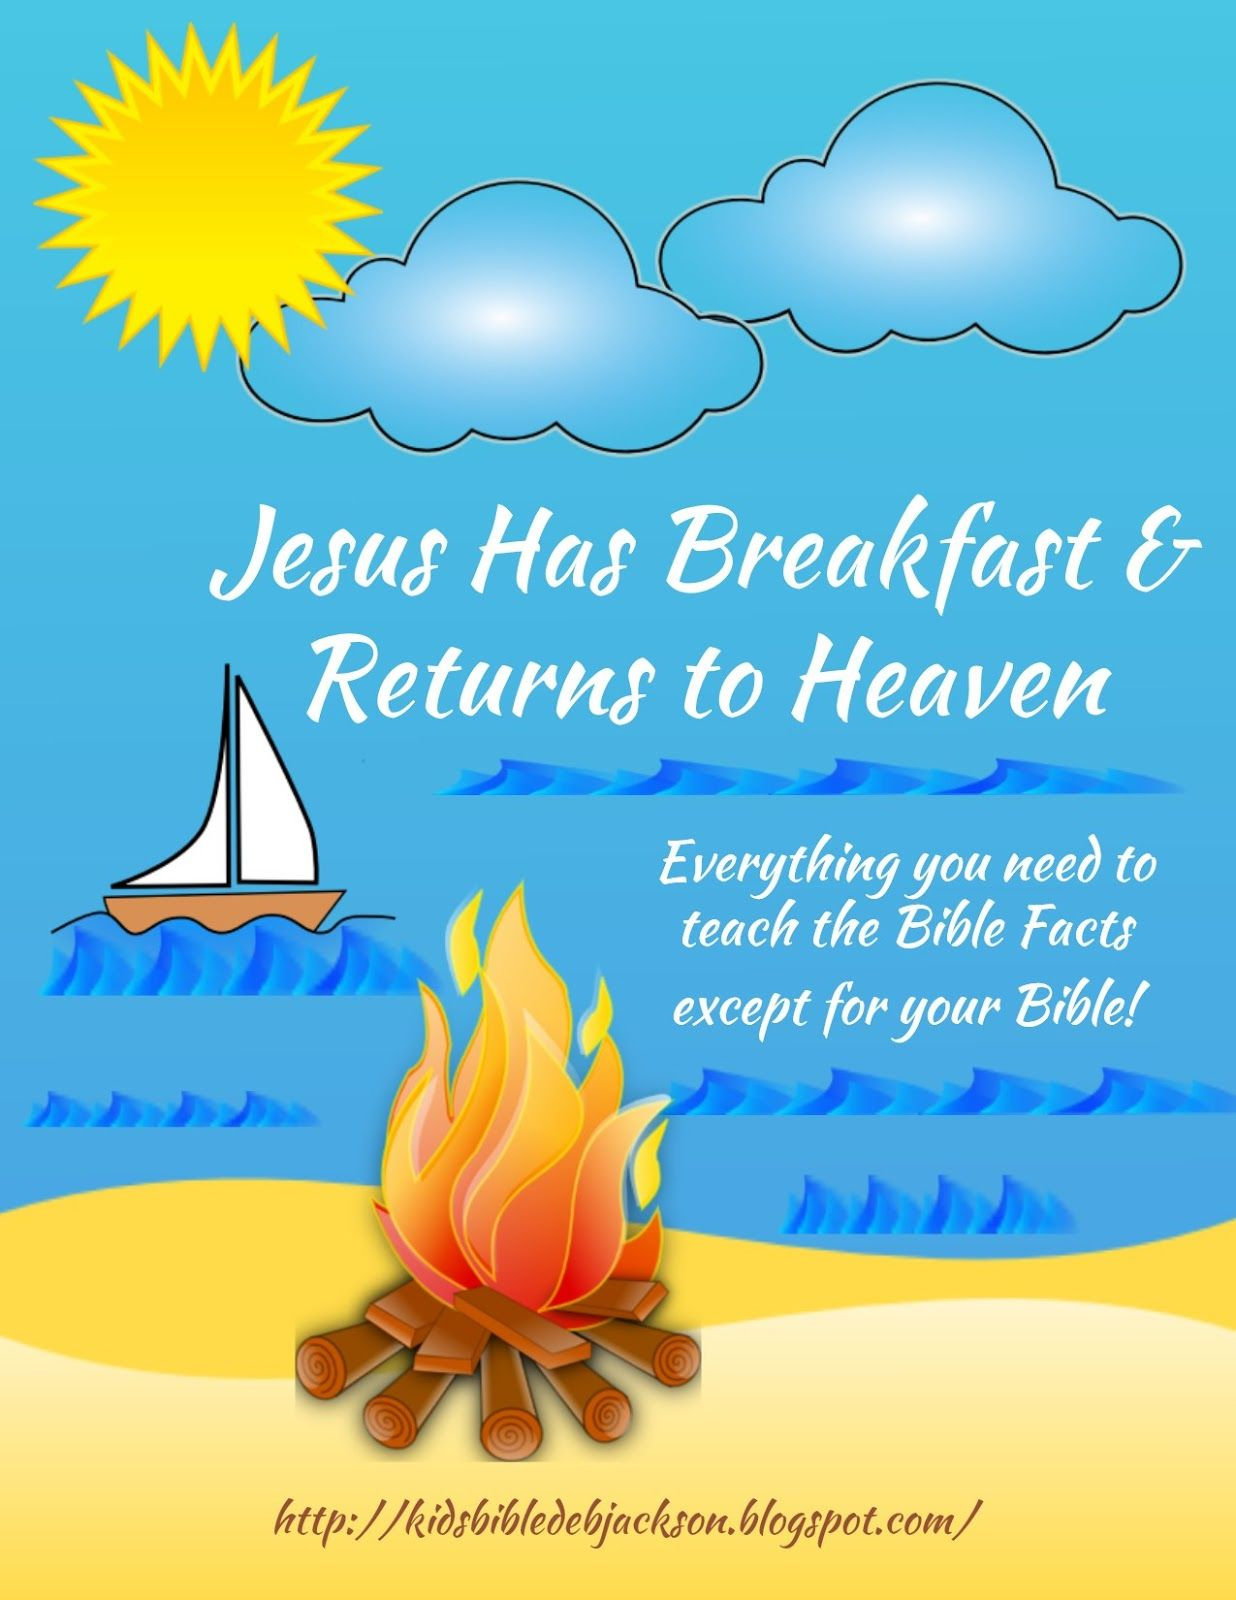 Jesus Has Breakfast With His Disciples Amp Returns To Heaven